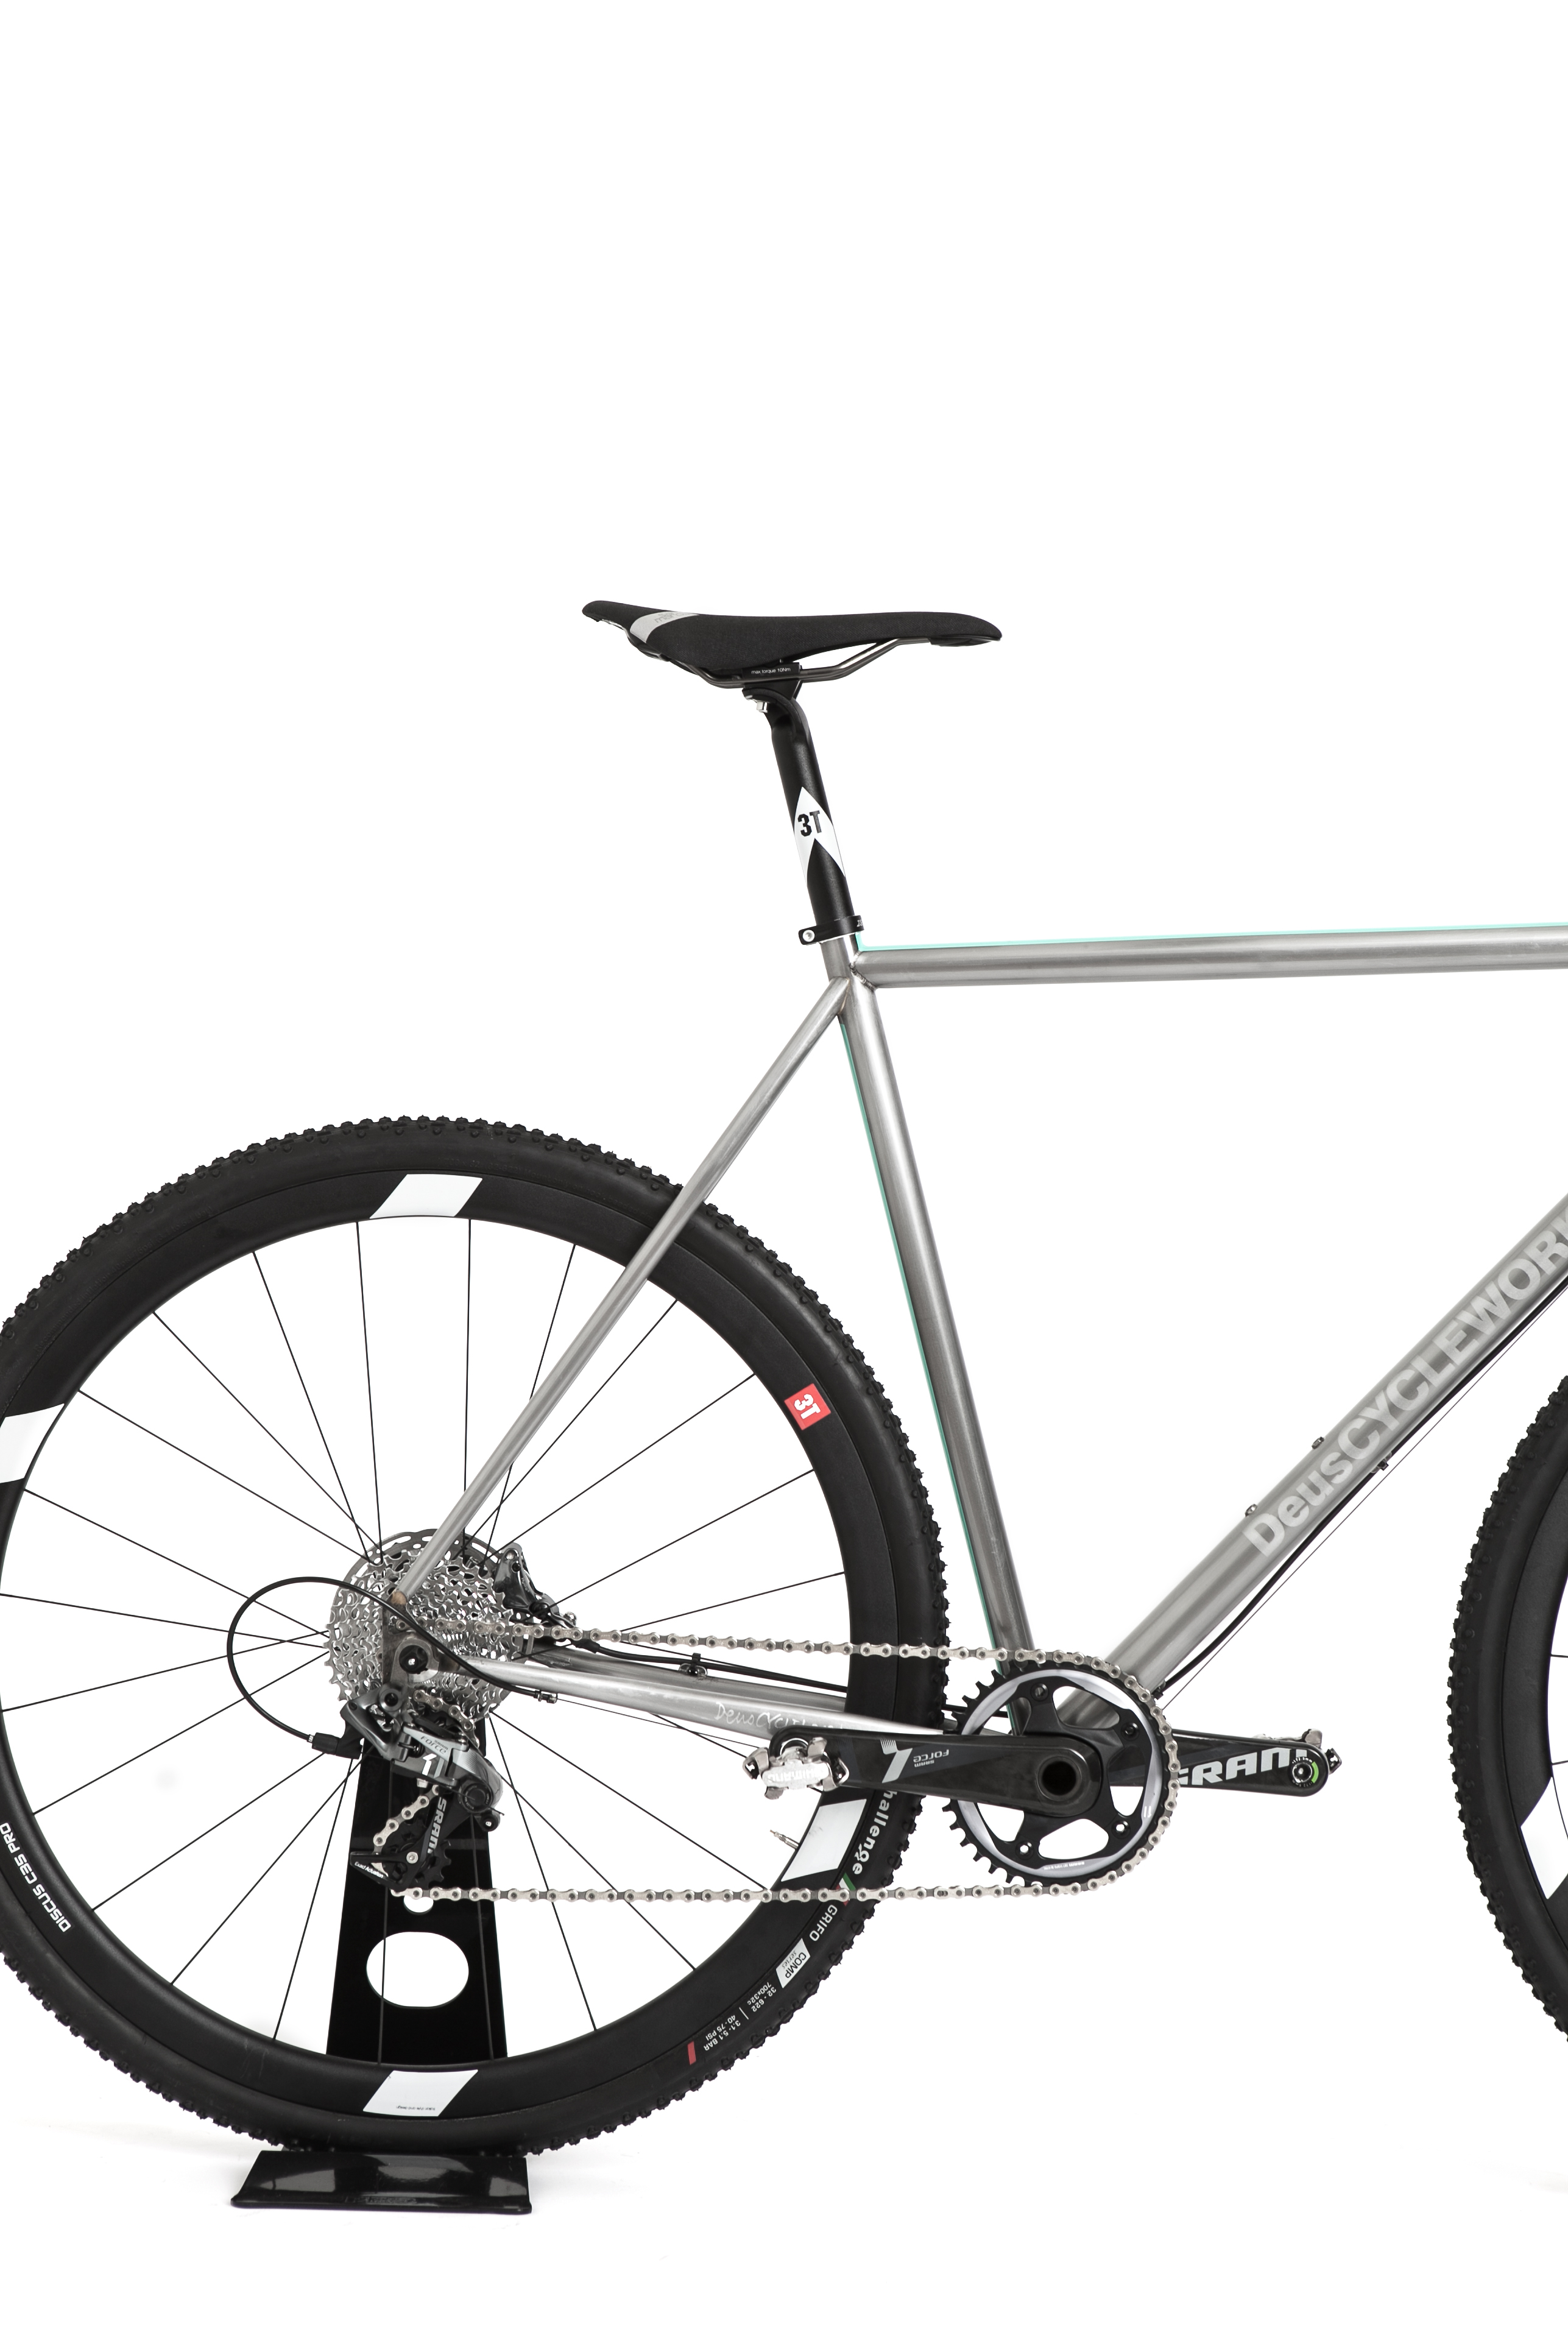 DEUS Stralùsc: the Deus Cyclocross and Gravel bike | Deus Ex ...